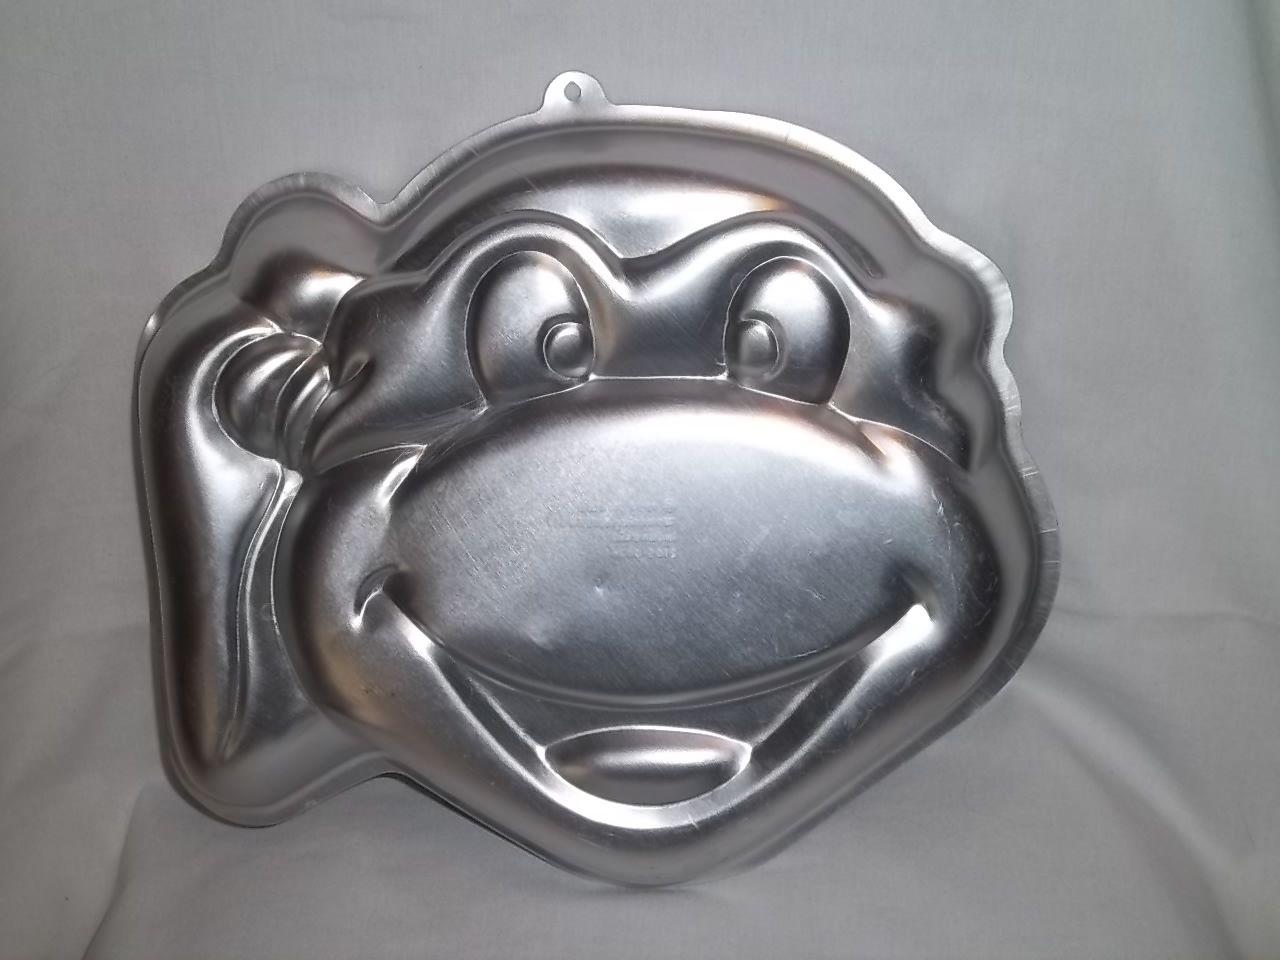 Wilton Ninja Turtle Face Cake Pan Instructions